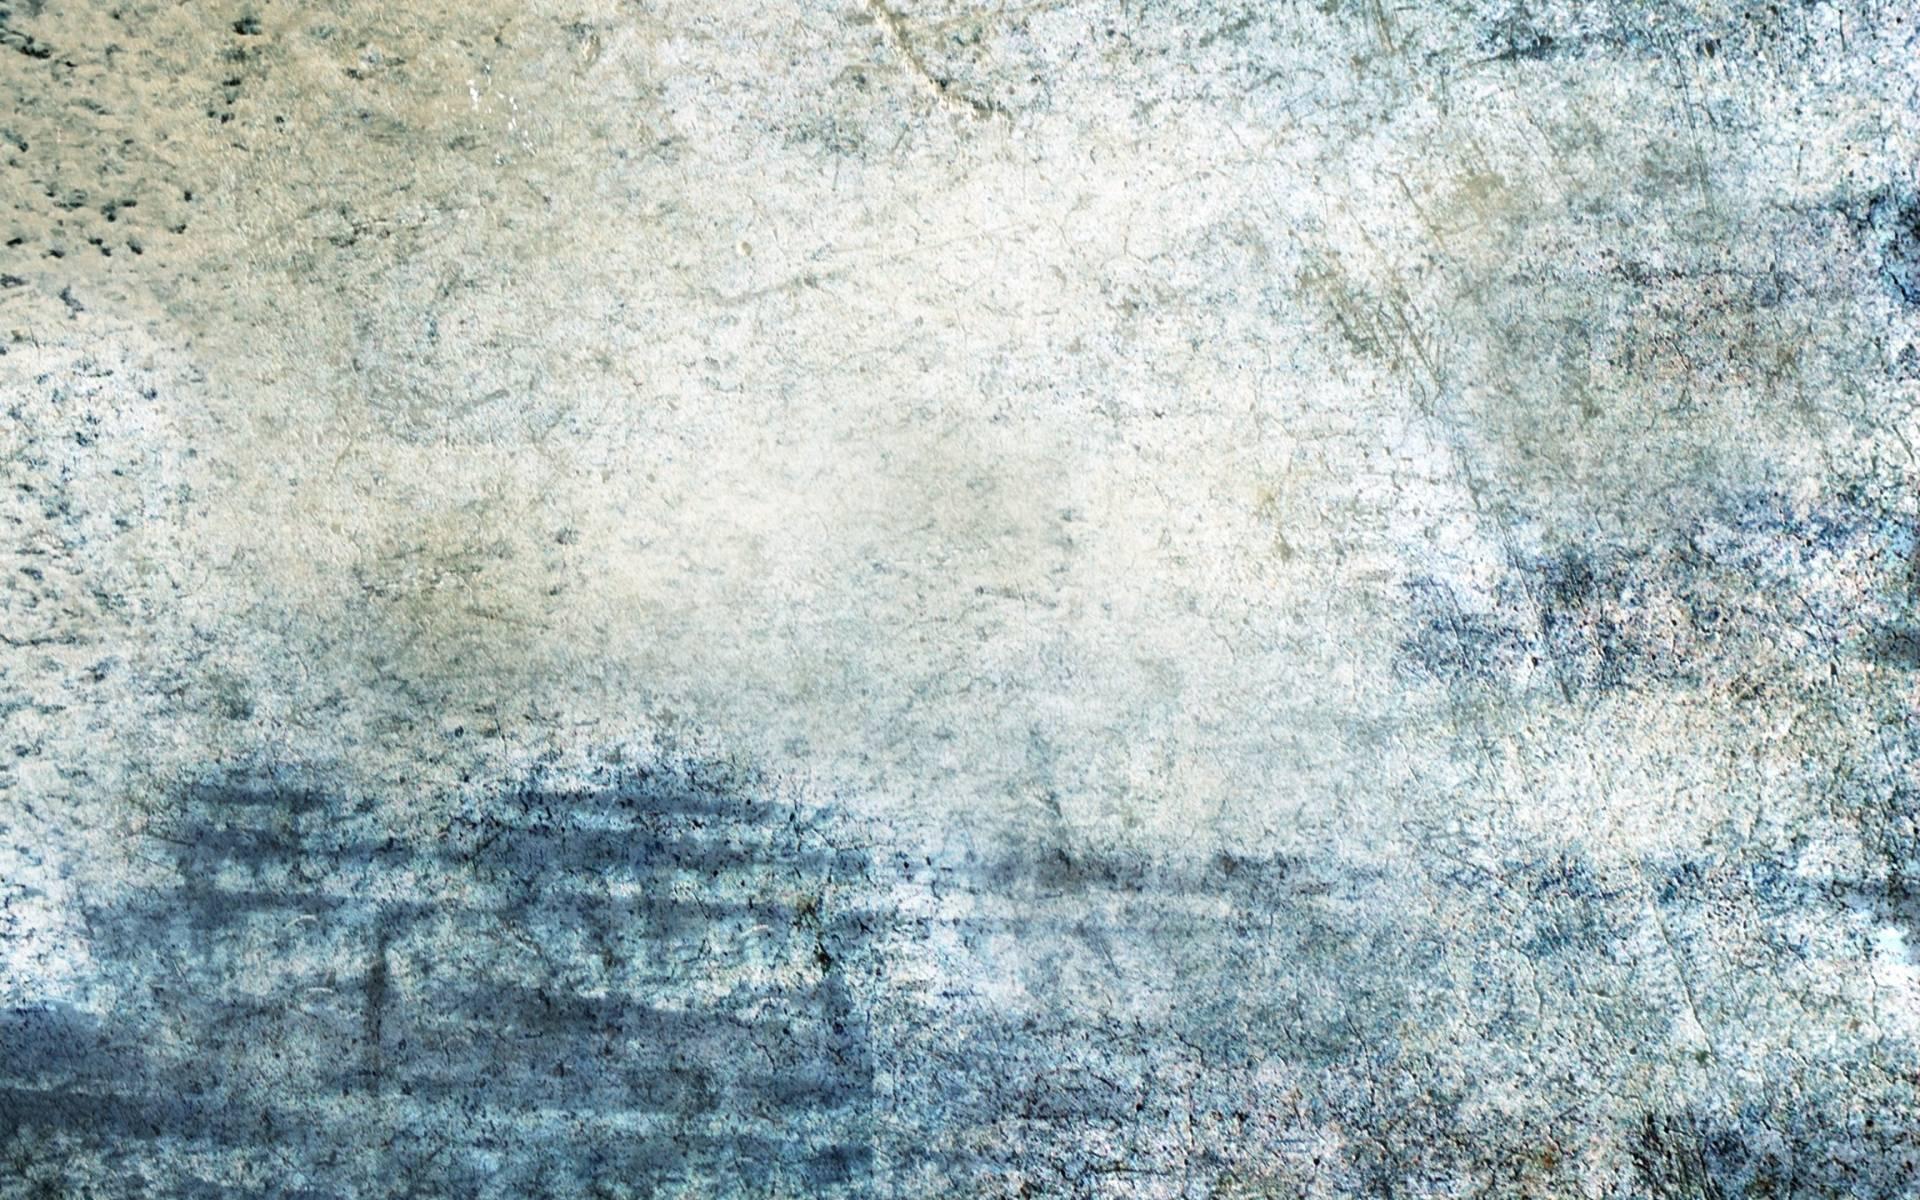 Download Grunge Scratches Wallpaper 1920x1200